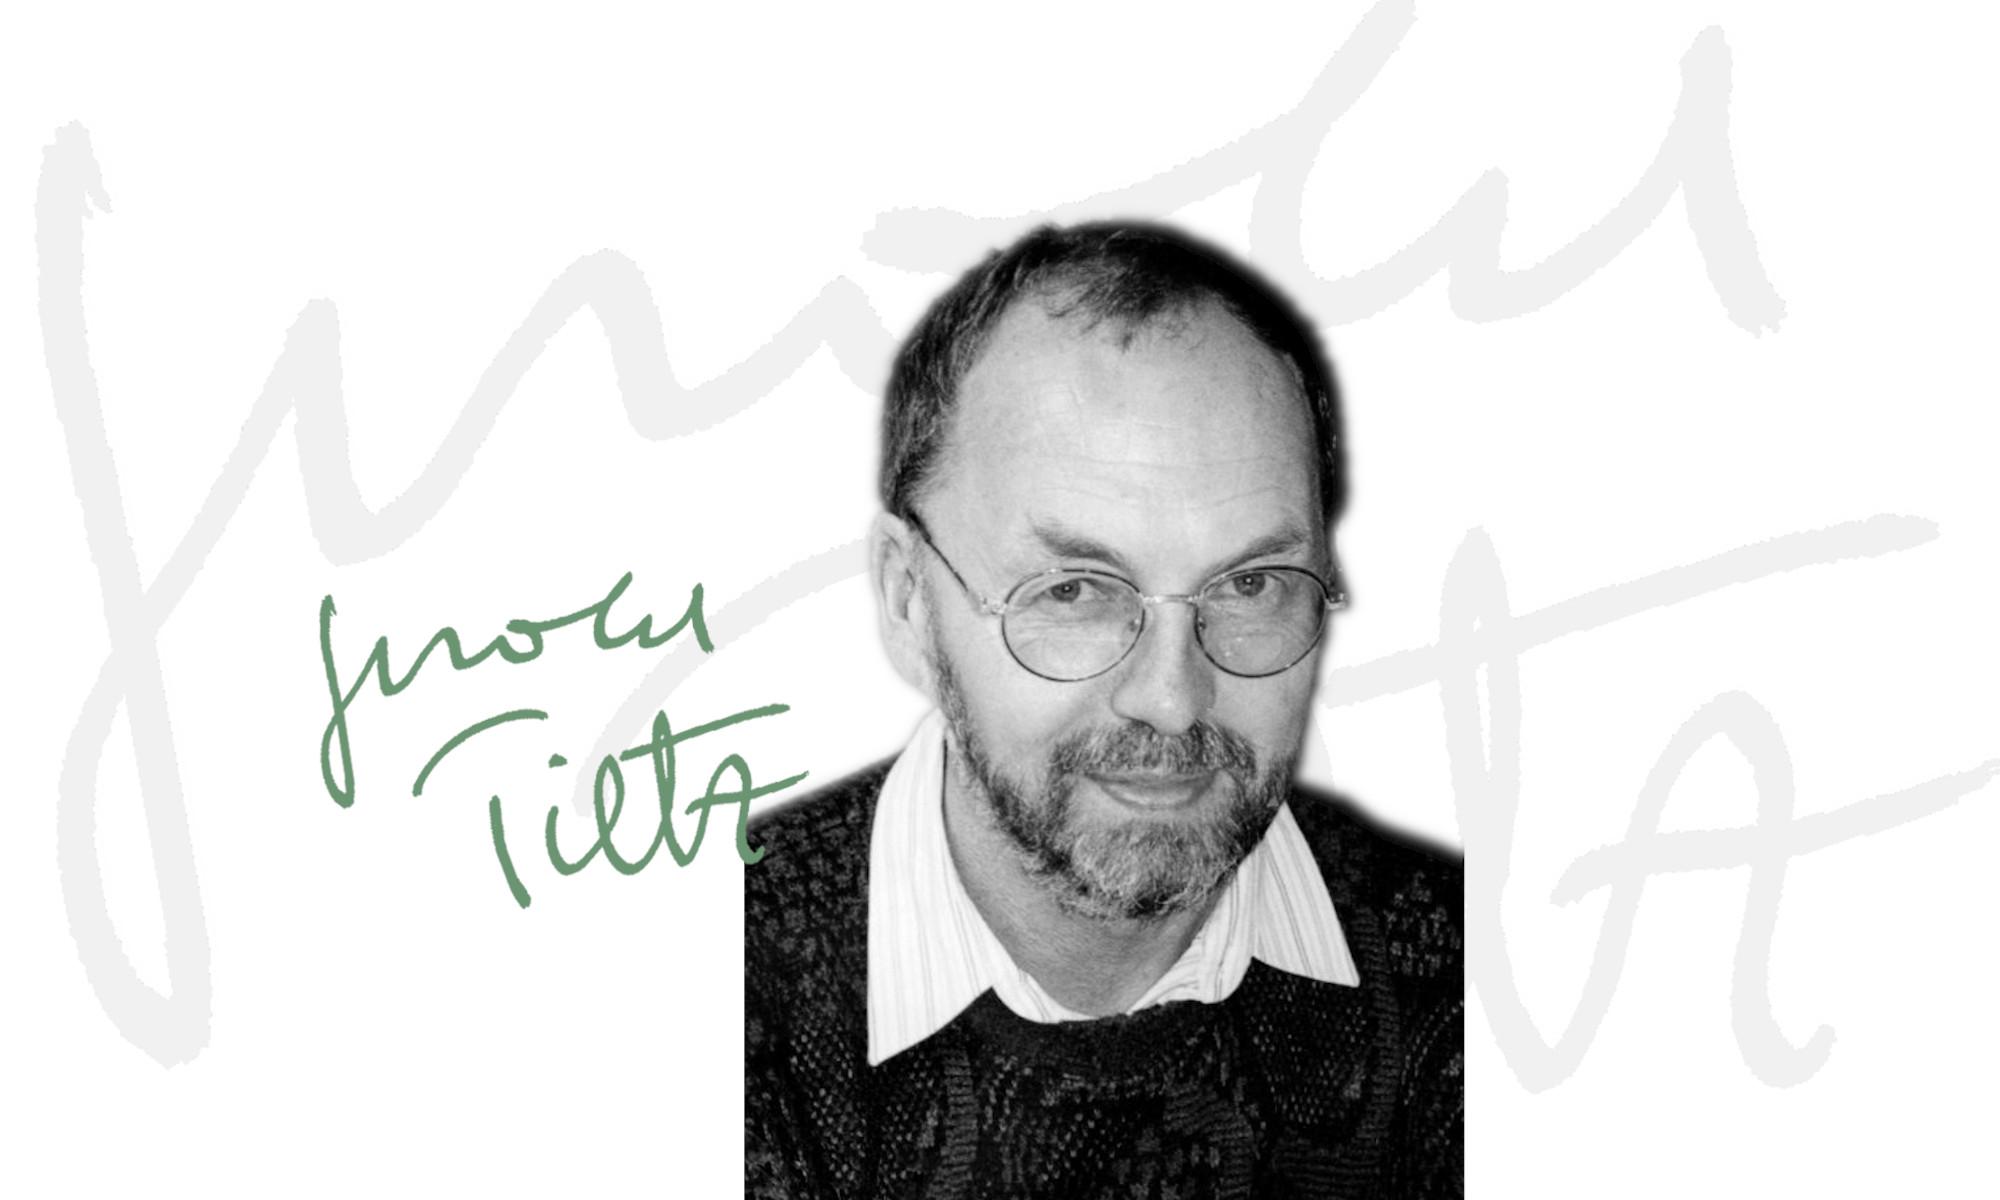 Gerold Tietz